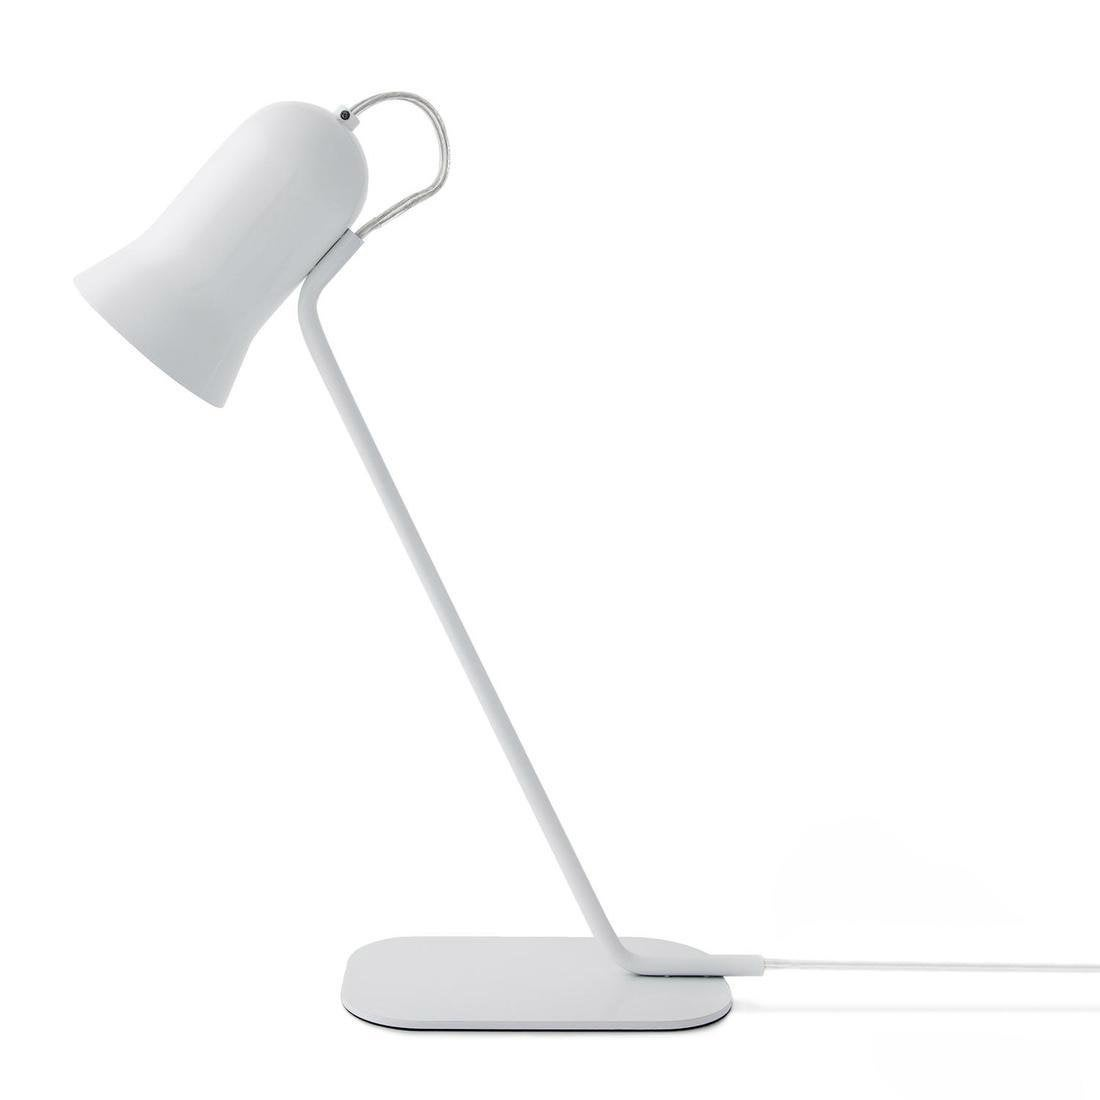 Lampe, e14 Angly LO EDITIONS, métal blanc, 11 W